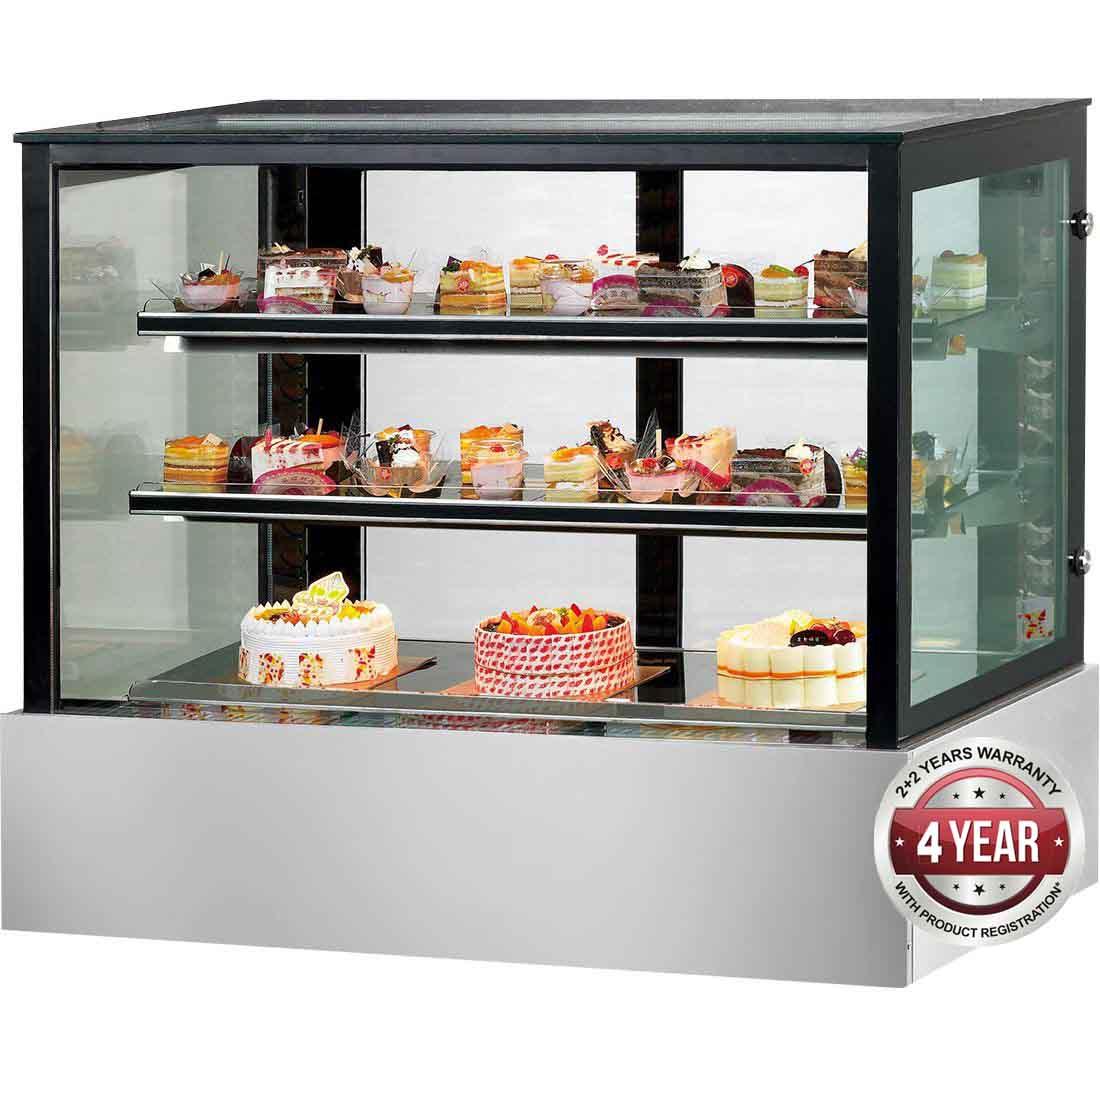 SSU180-2XB Black Trim Square Glass Cake Display 2 Shelves 1800x700x1100